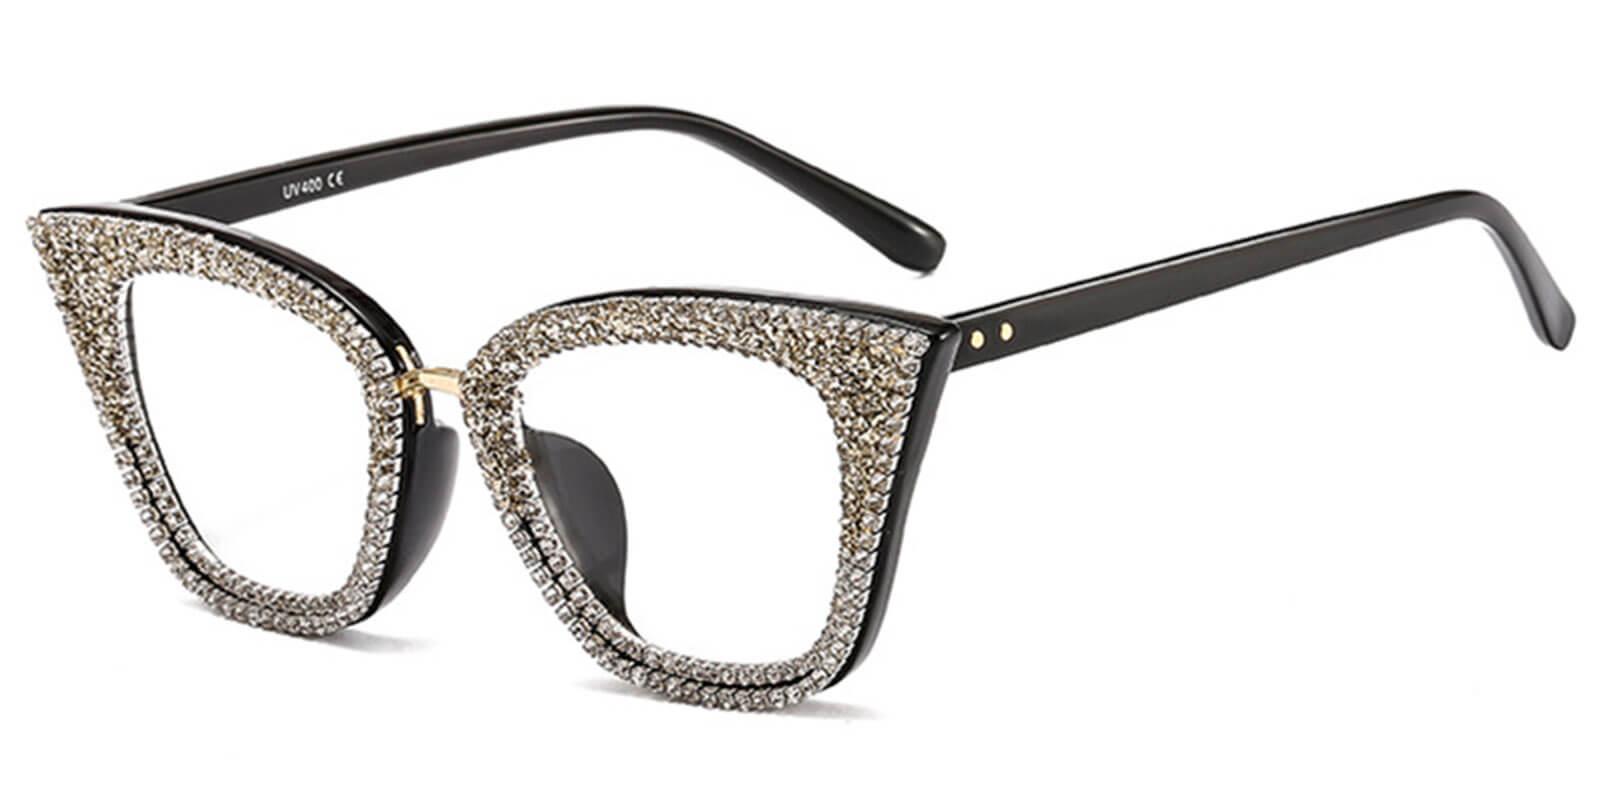 Giada-Retro Womens Cat Eye Glasses with Diamonds Design